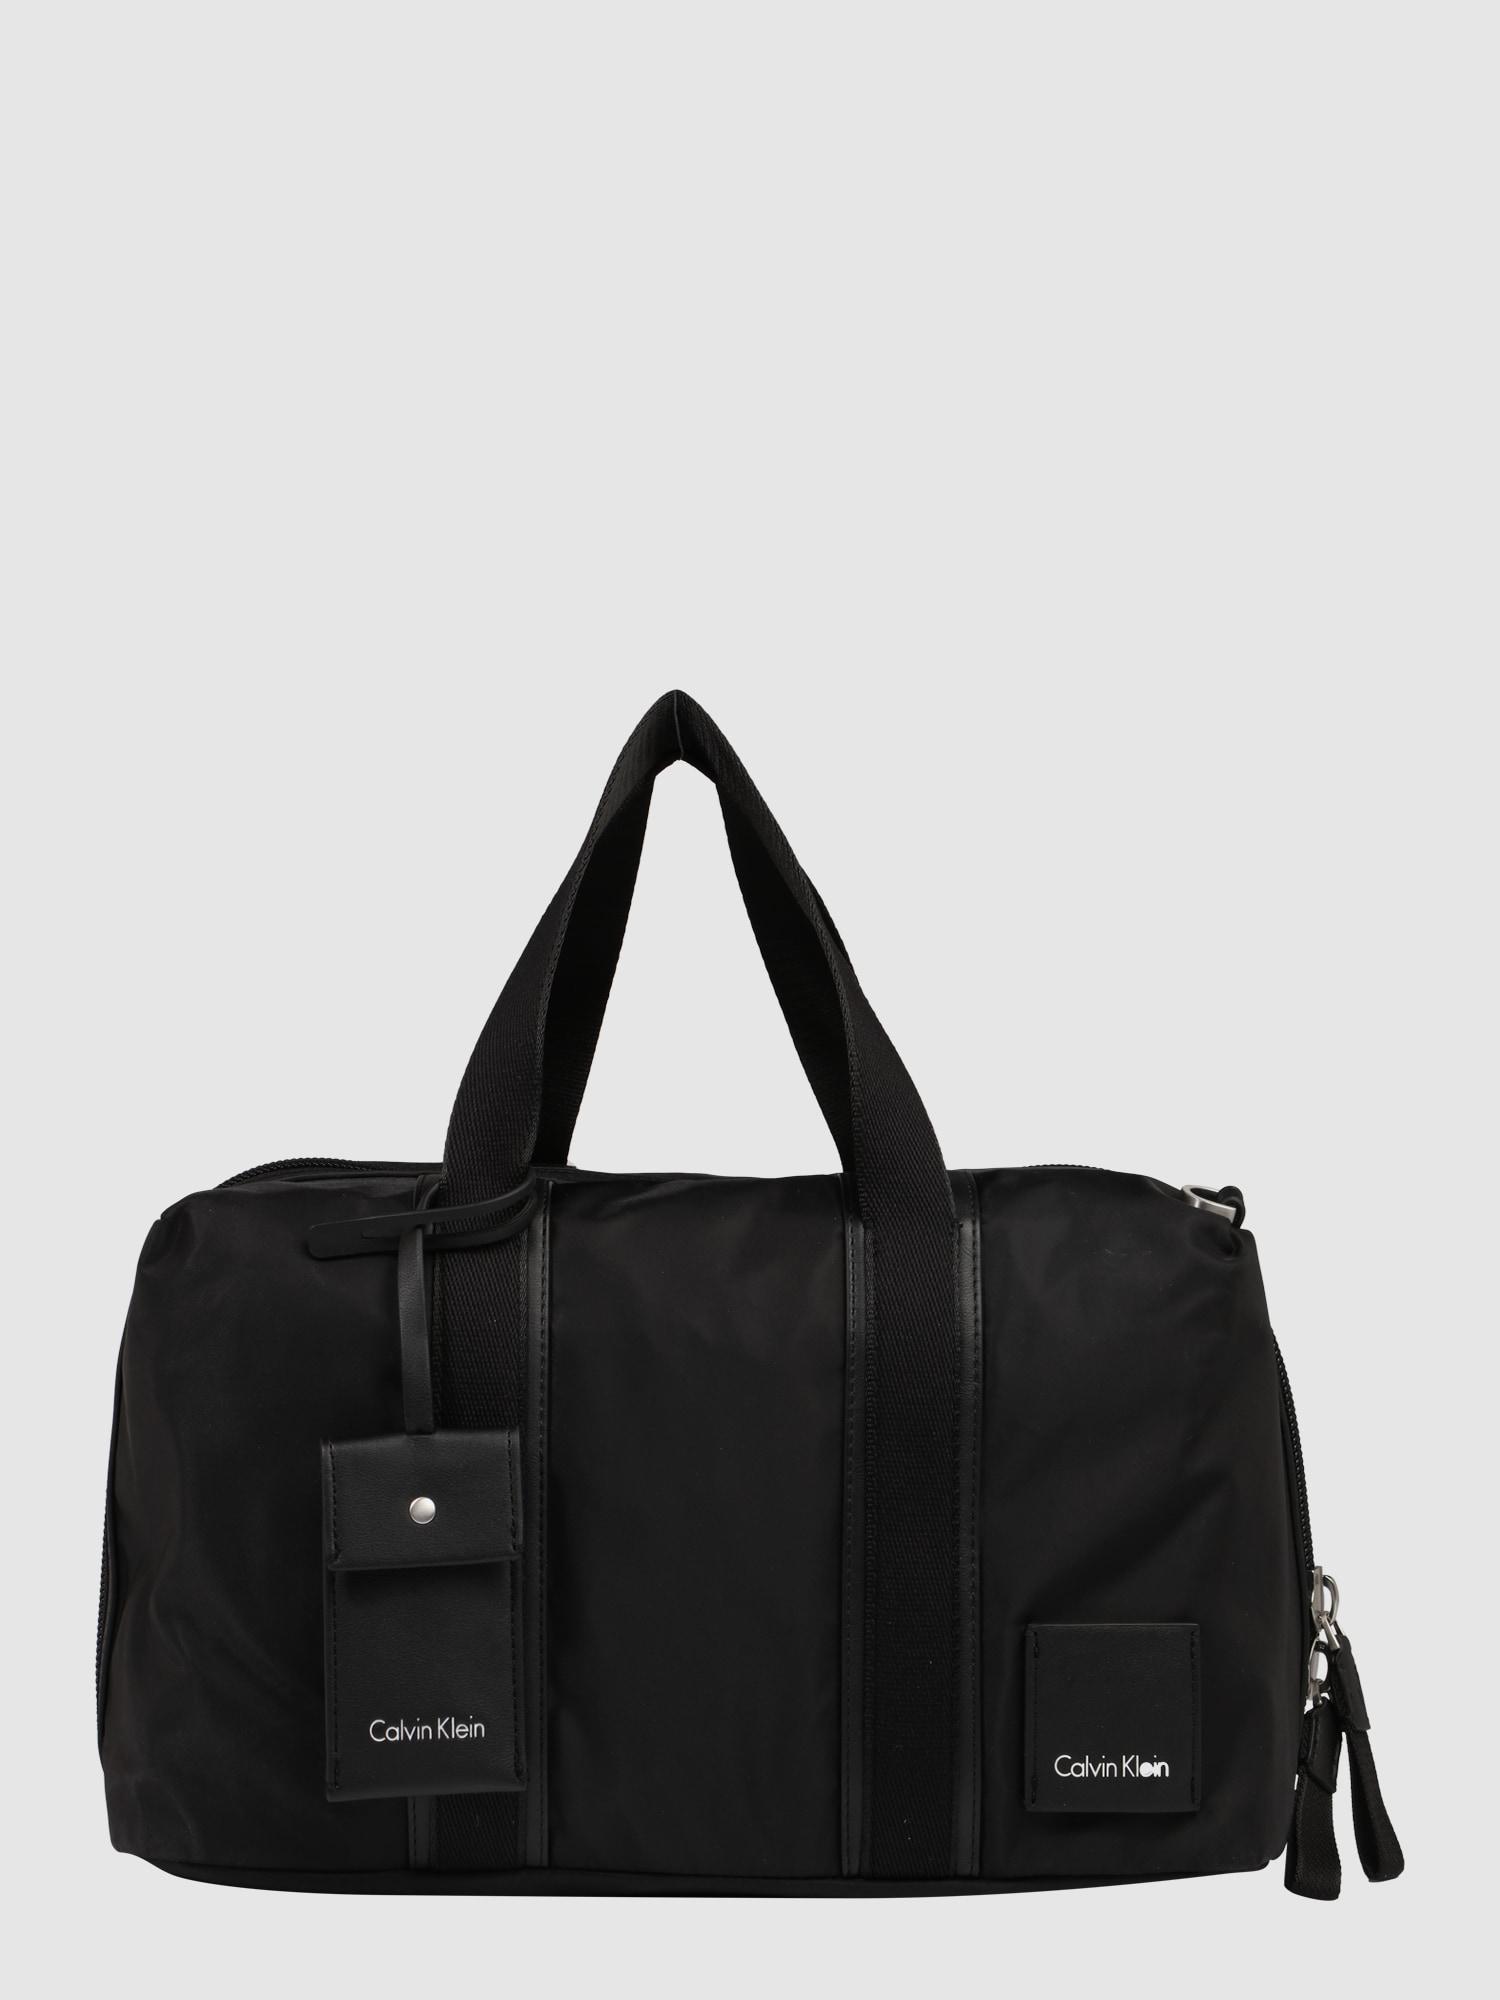 calvin klein handtasche 39 fluid duffle 39 in schwarz about you. Black Bedroom Furniture Sets. Home Design Ideas